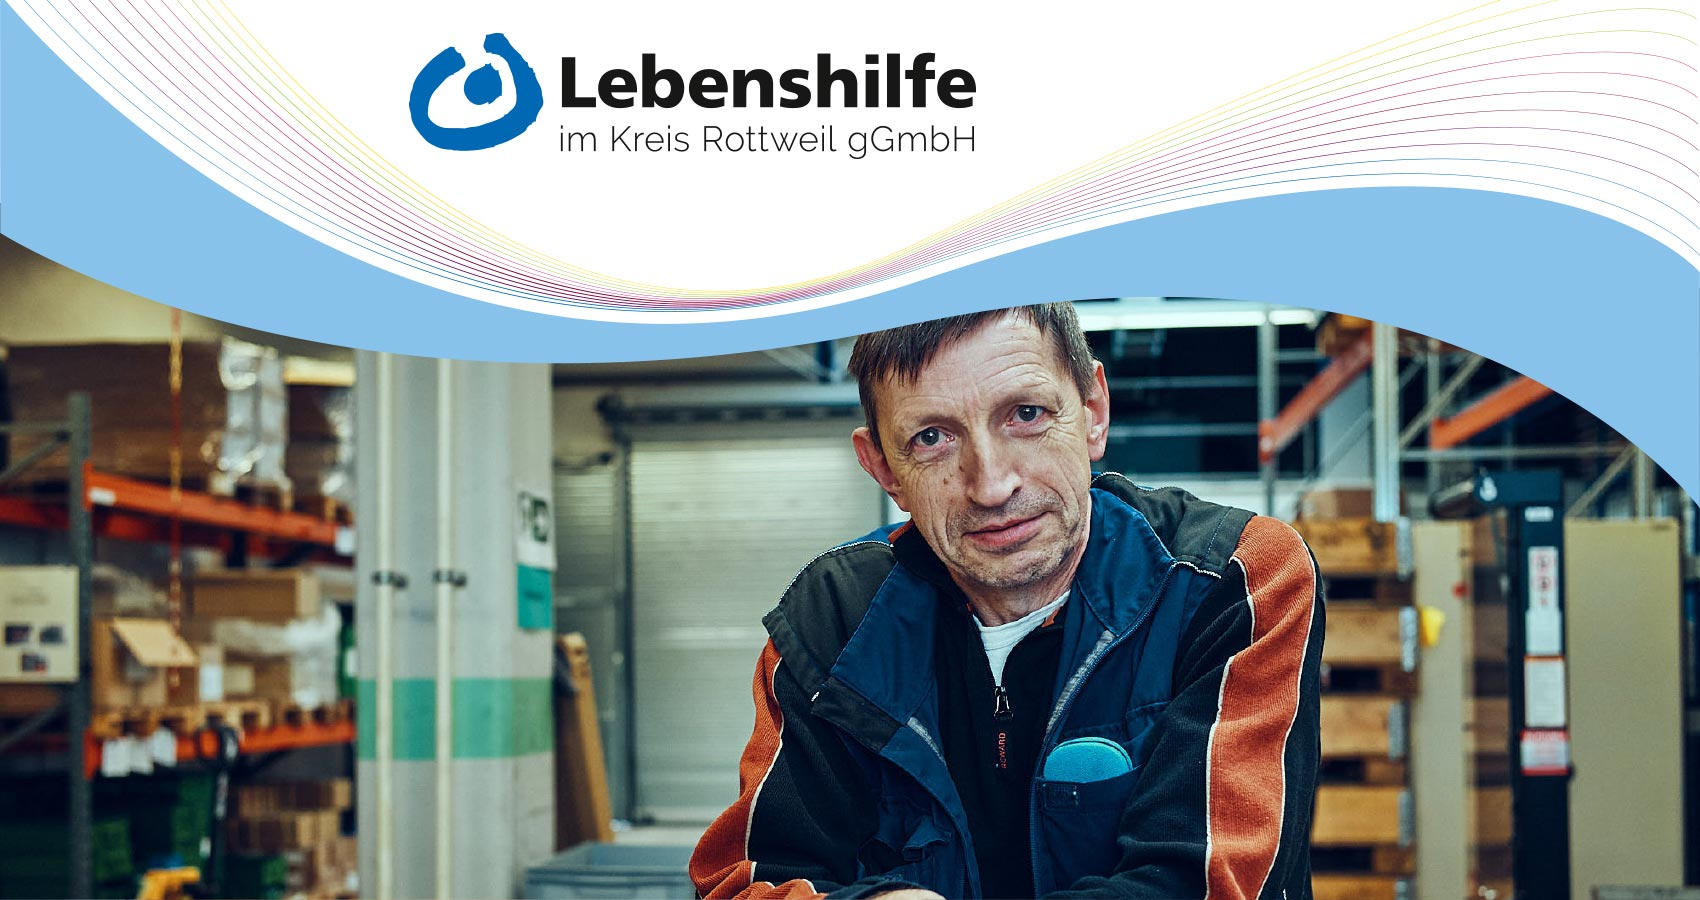 Lebenshilfe im Kreis Rottweil gGmbH - Arbeitsbereich Haustechnik